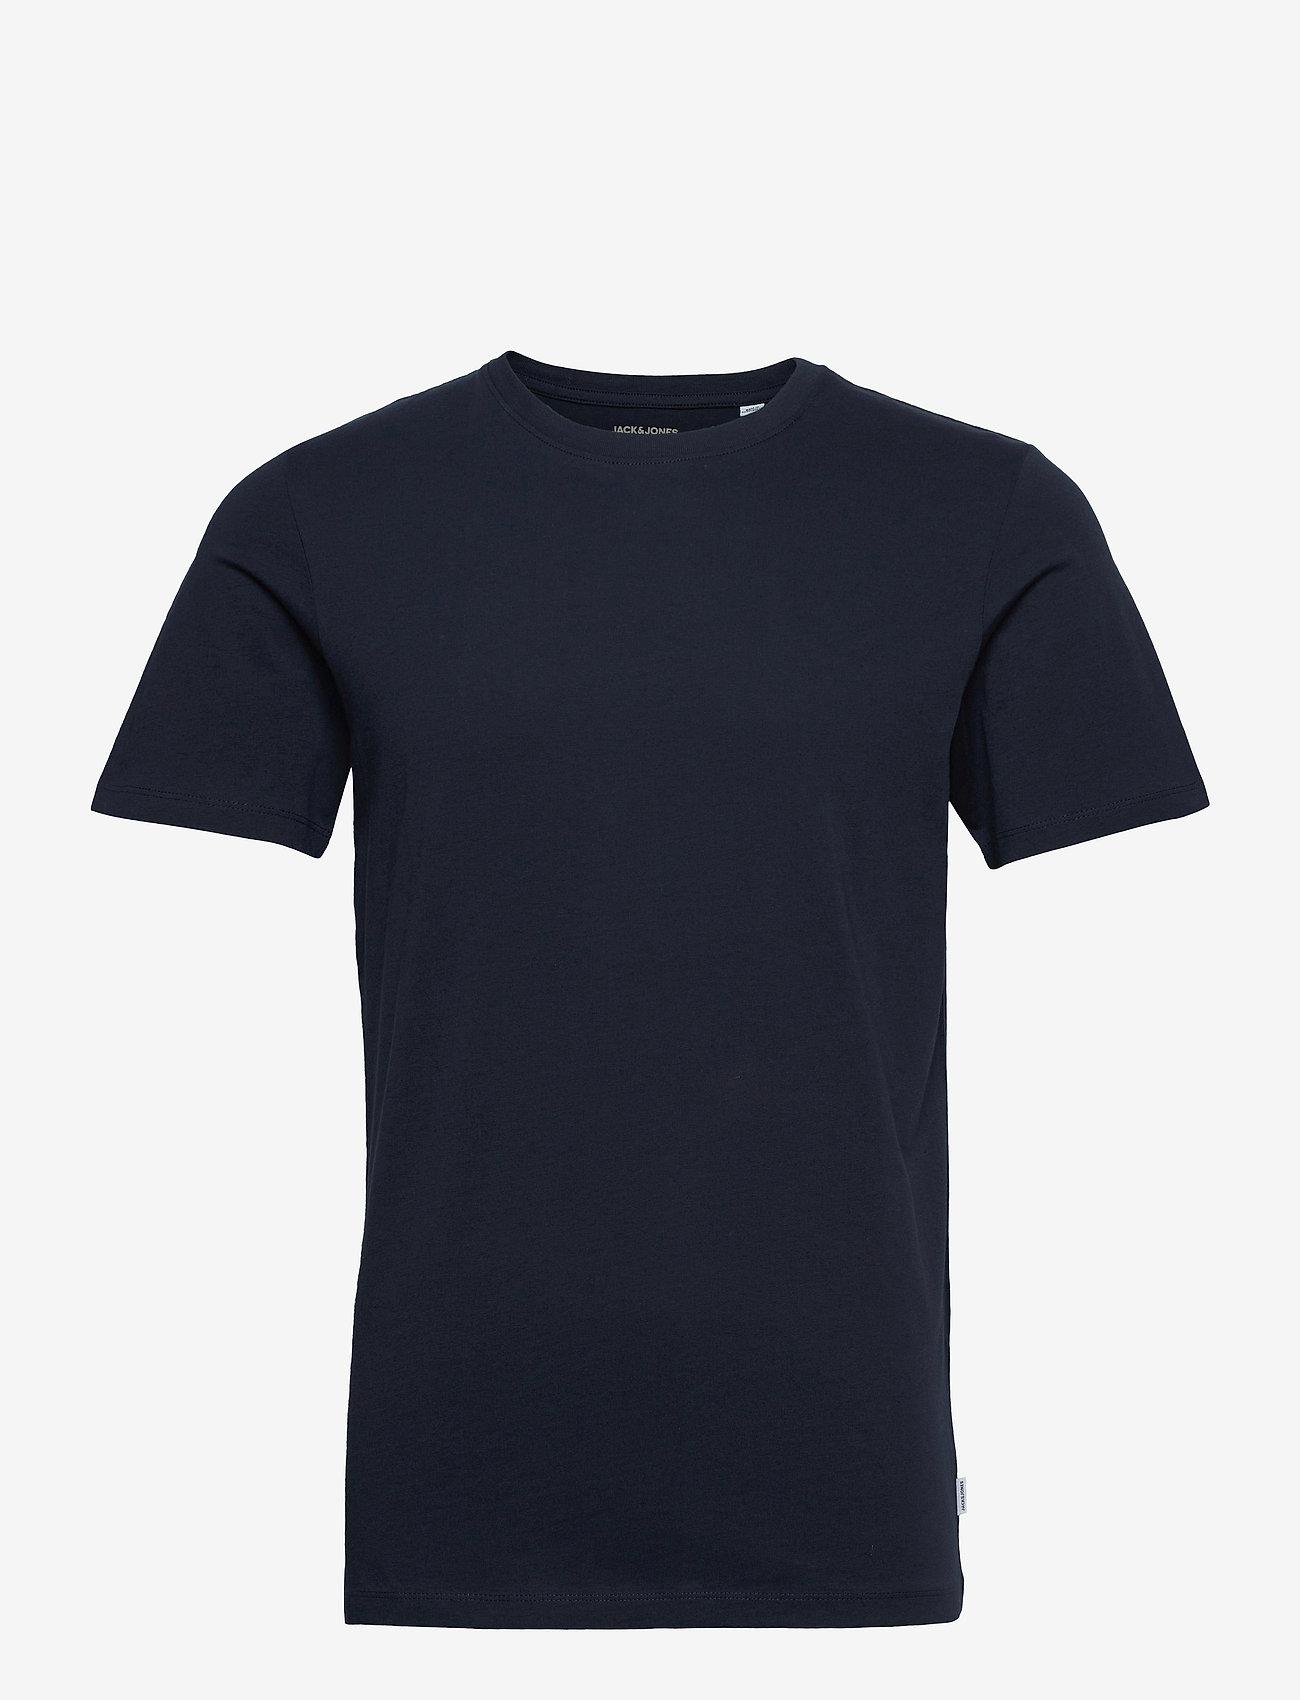 Jack & Jones - JJEORGANIC BASIC TEE SS O-NECK - basic t-shirts - navy blazer - 0